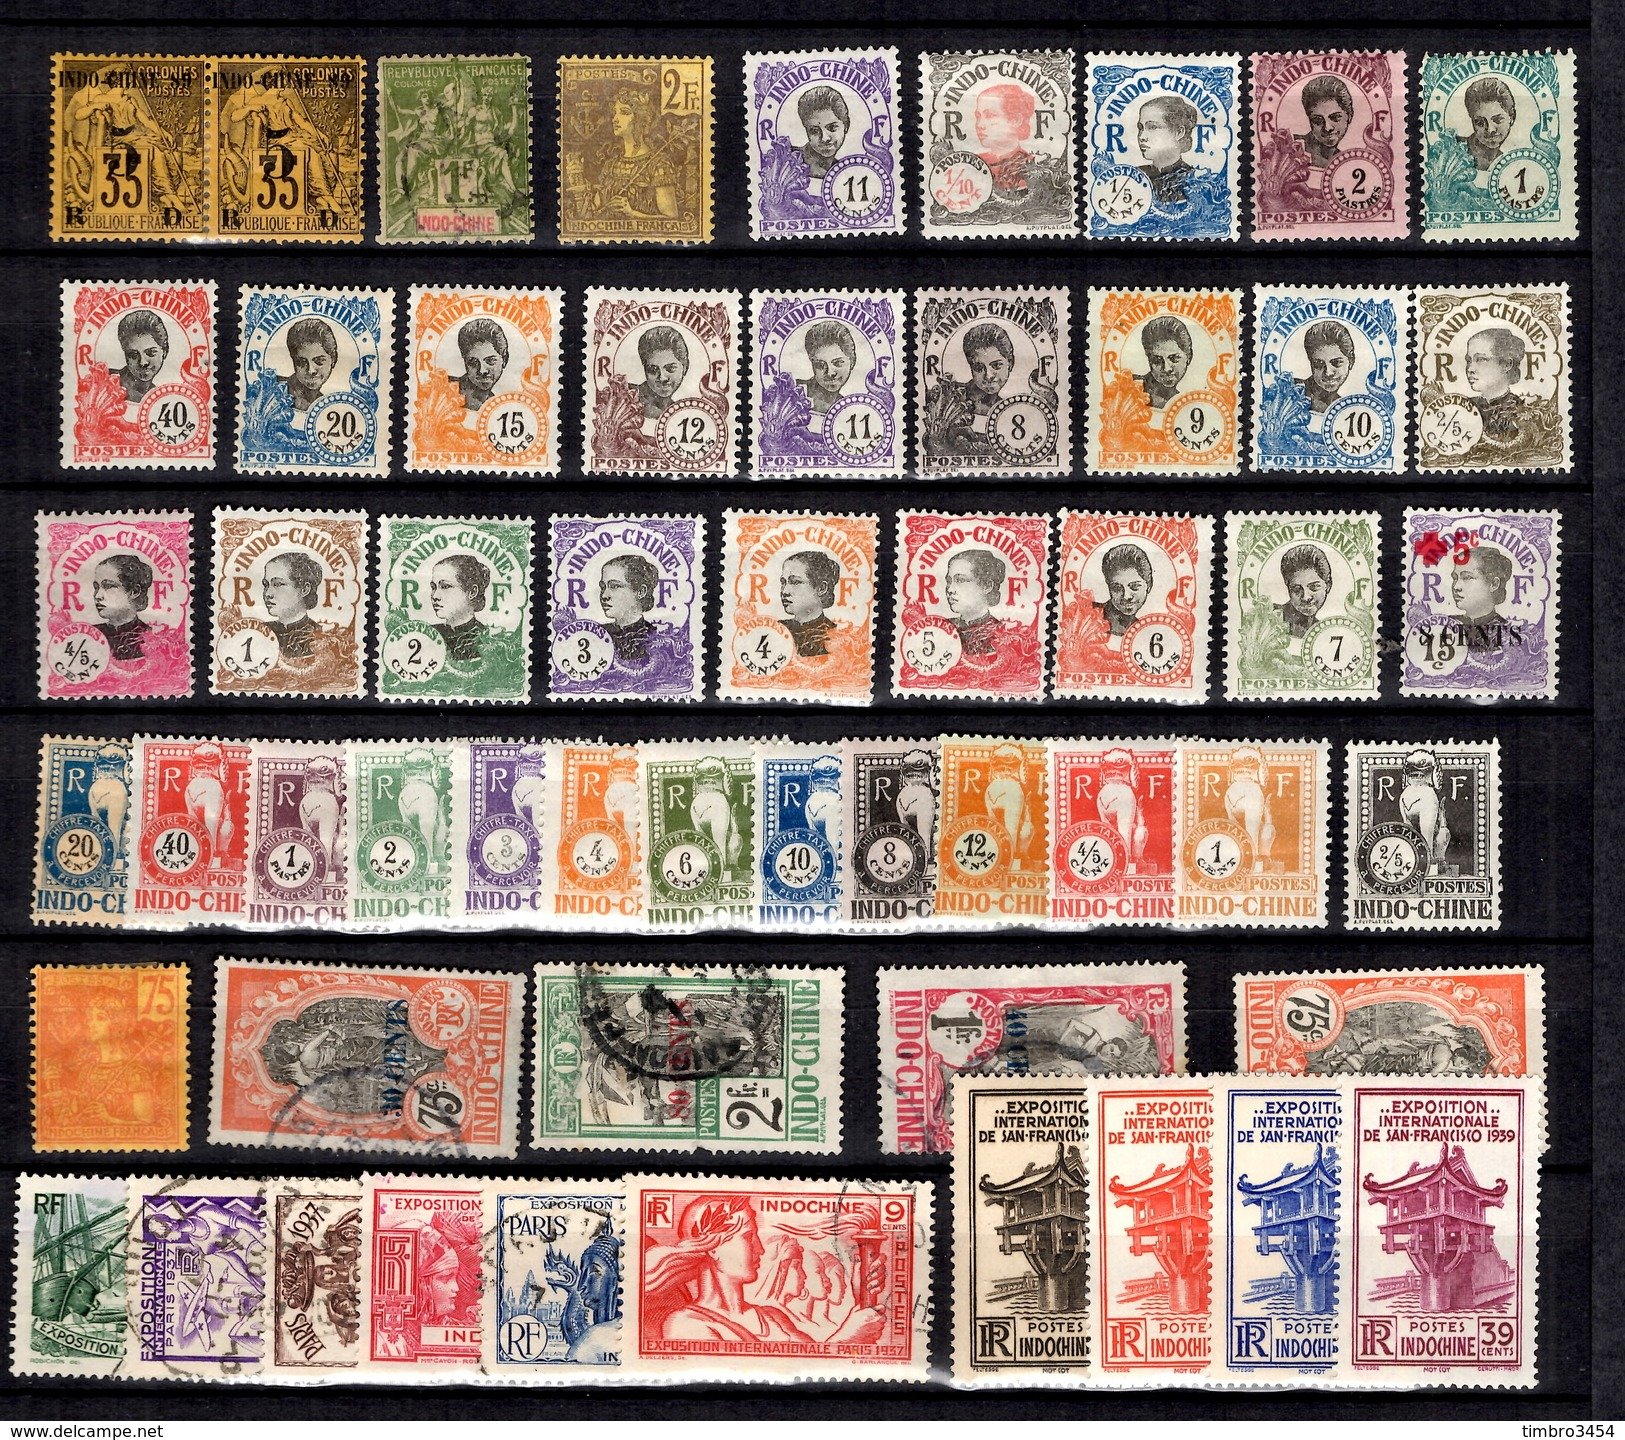 Indochine Belle Petite Collection D'anciens 1889/1937. Bonnes Valeurs. B/TB. A Saisir! - Indochine (1889-1945)